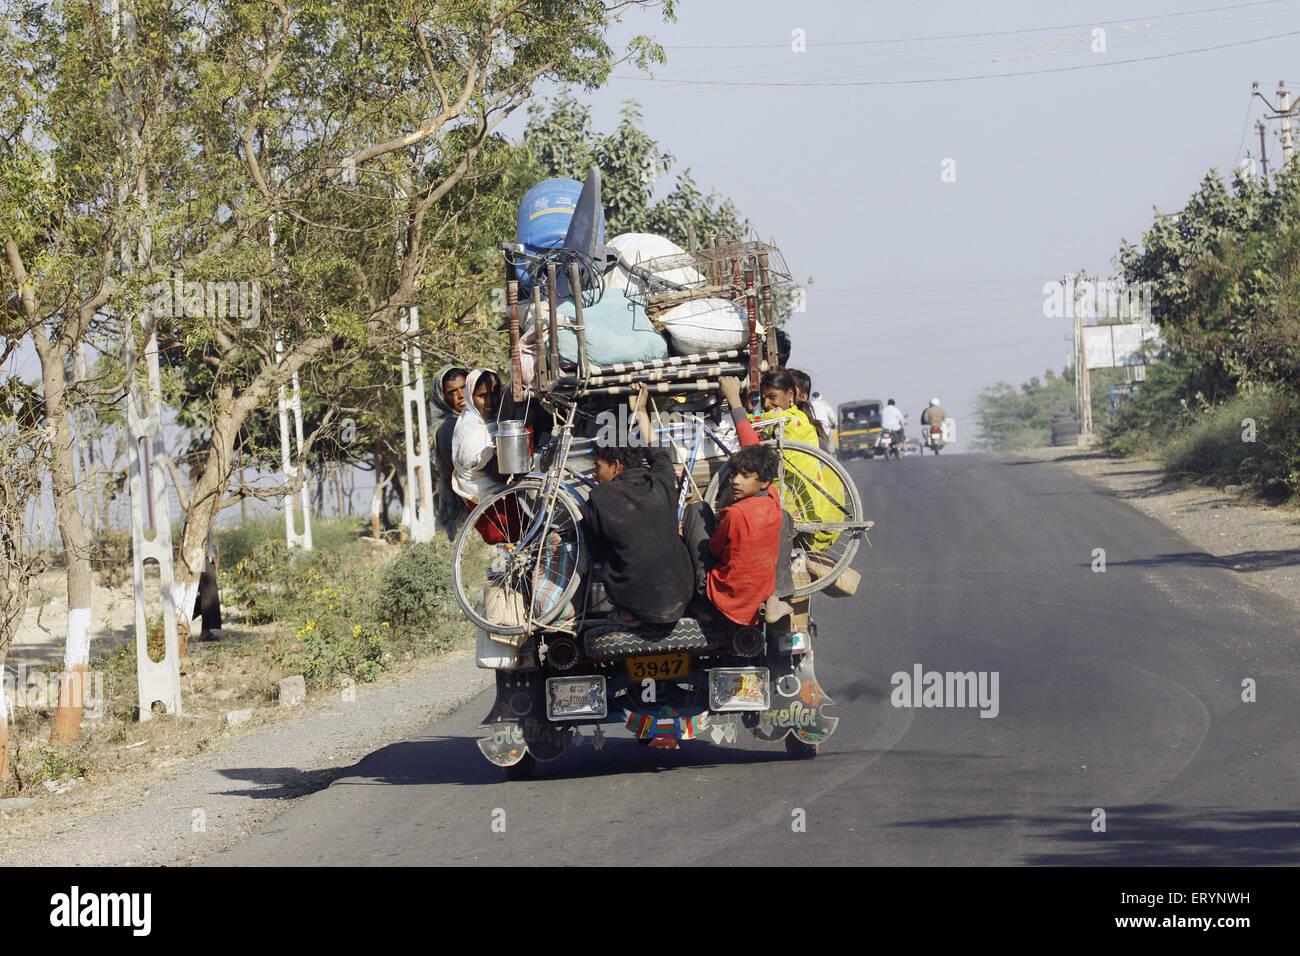 Les résidents locaux à chakdo;;; Inde Gujarat Porbandar NOMR Photo Stock